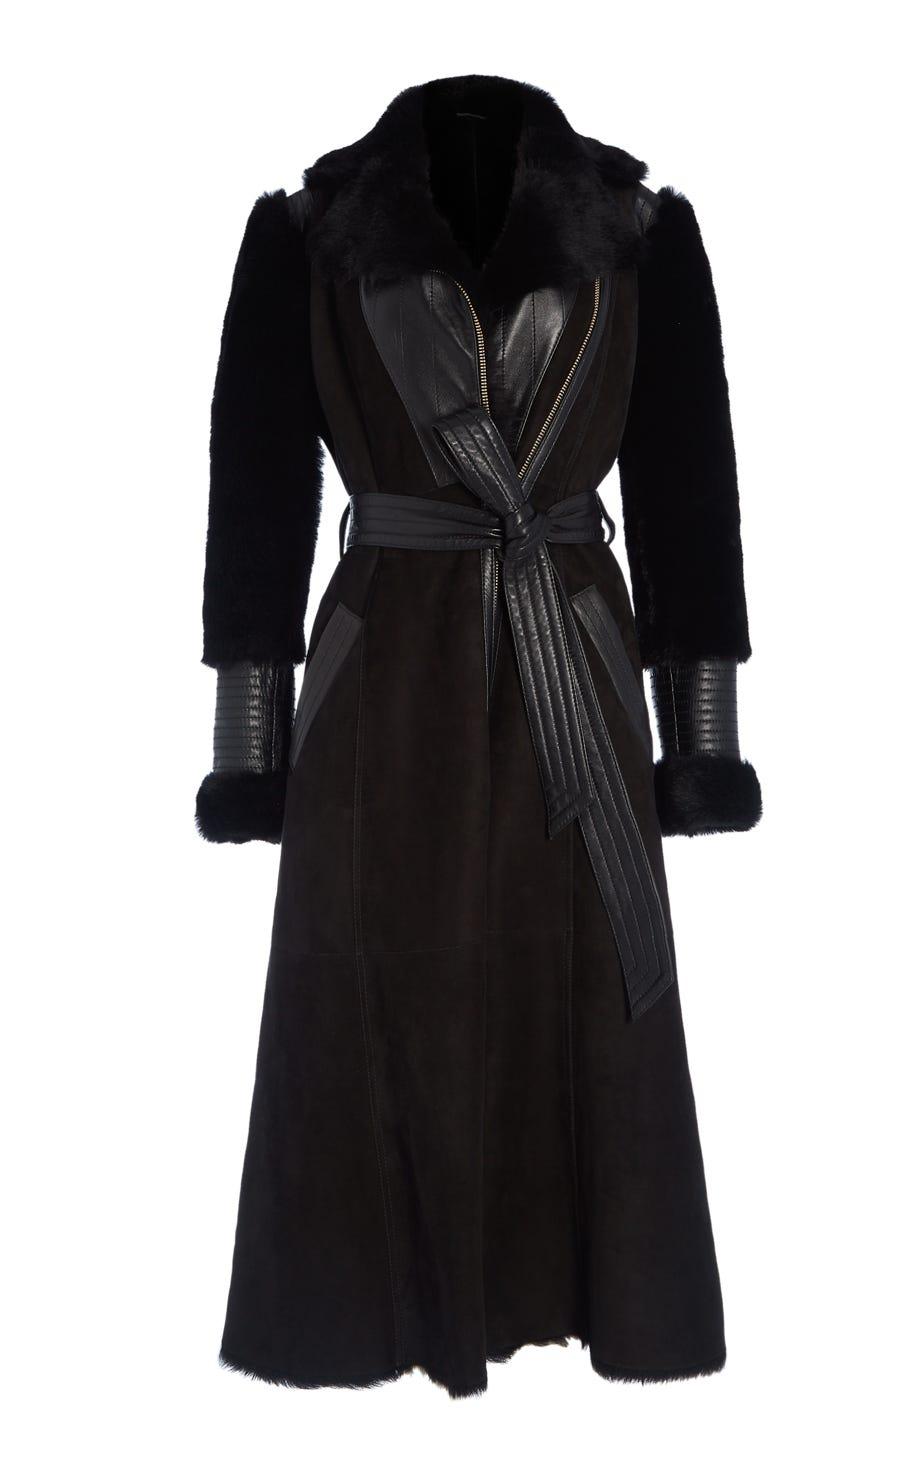 Saskia Shearling Coat